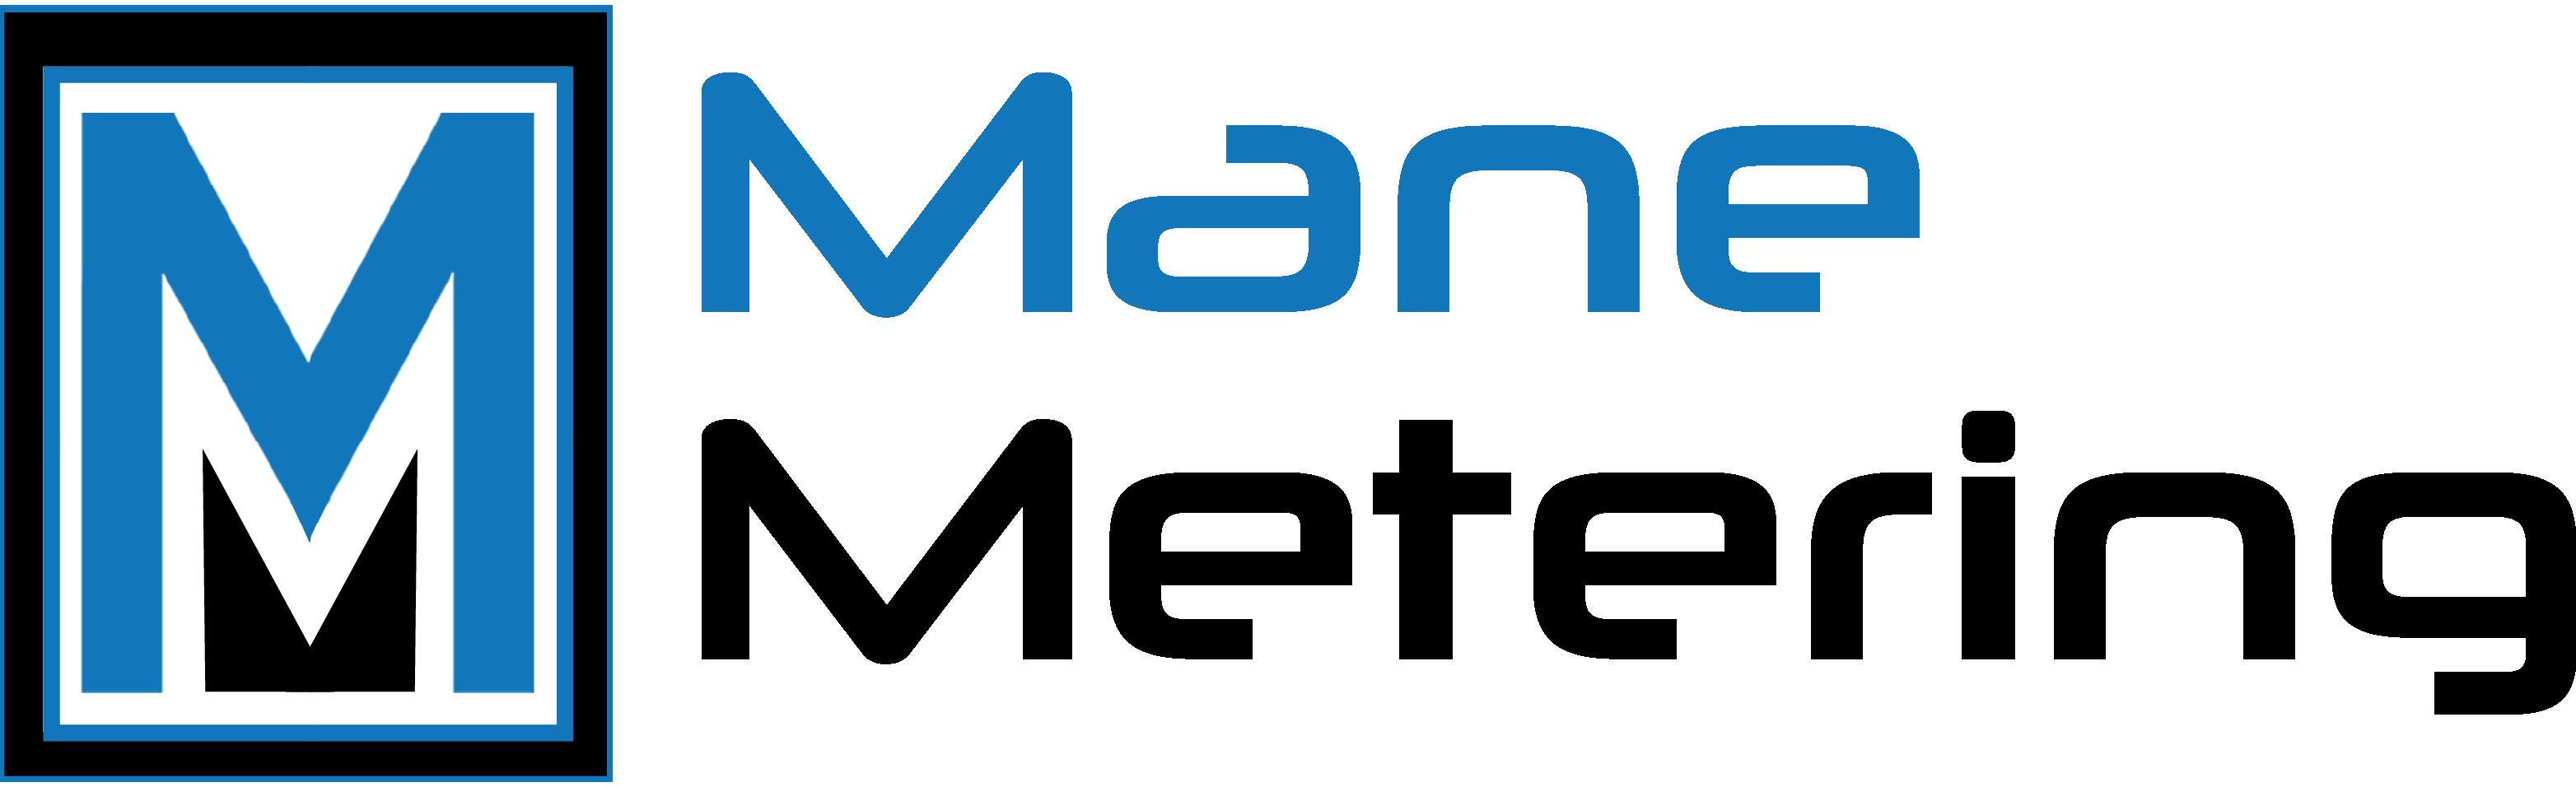 Mane Metering Services